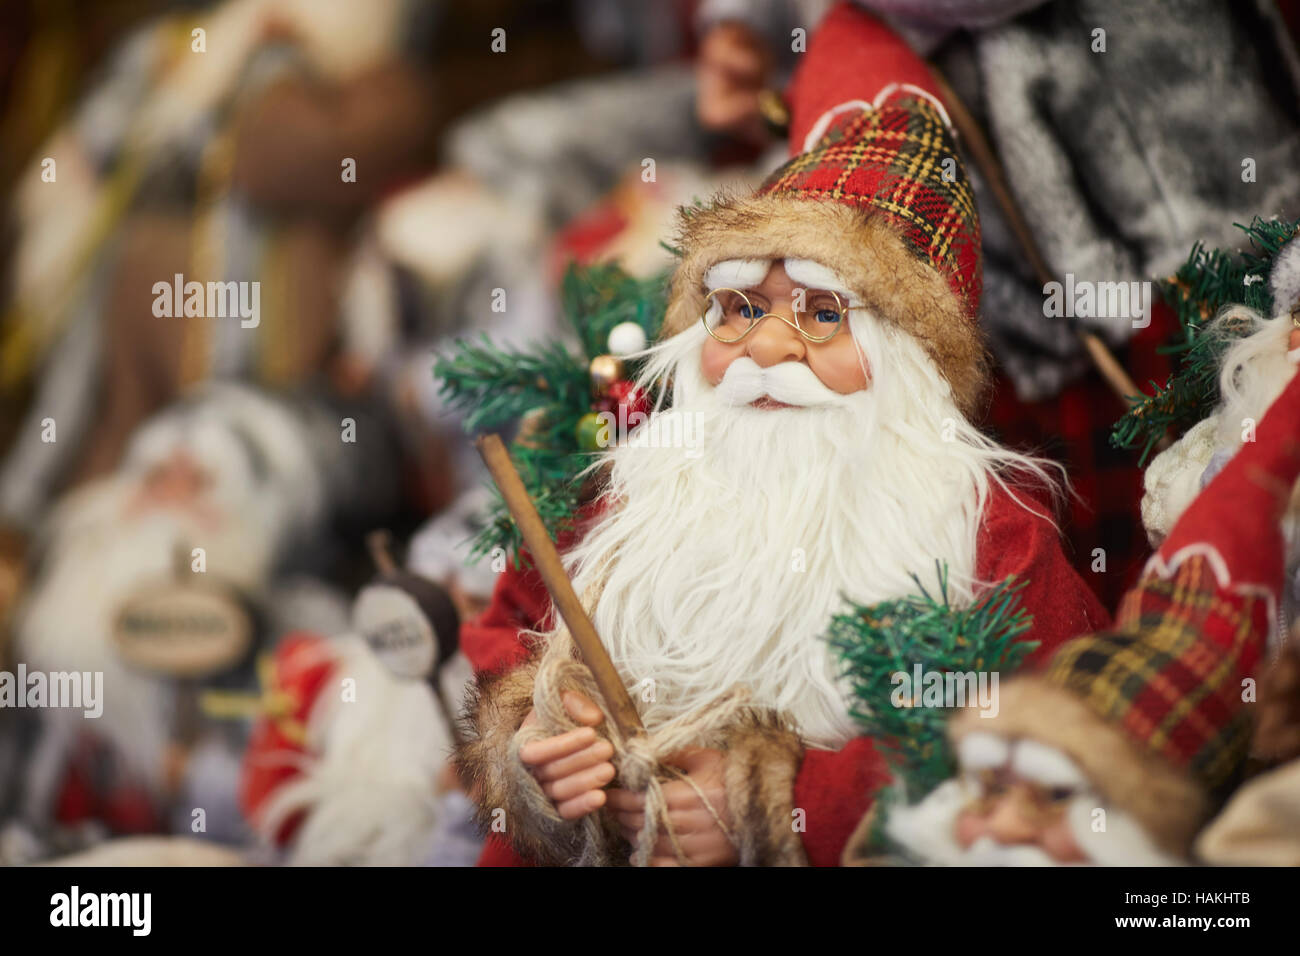 Sanat clause traditional doll decoration   figure toys Christmas xmas festive seasonal market stalls gift  Market - Stock Image